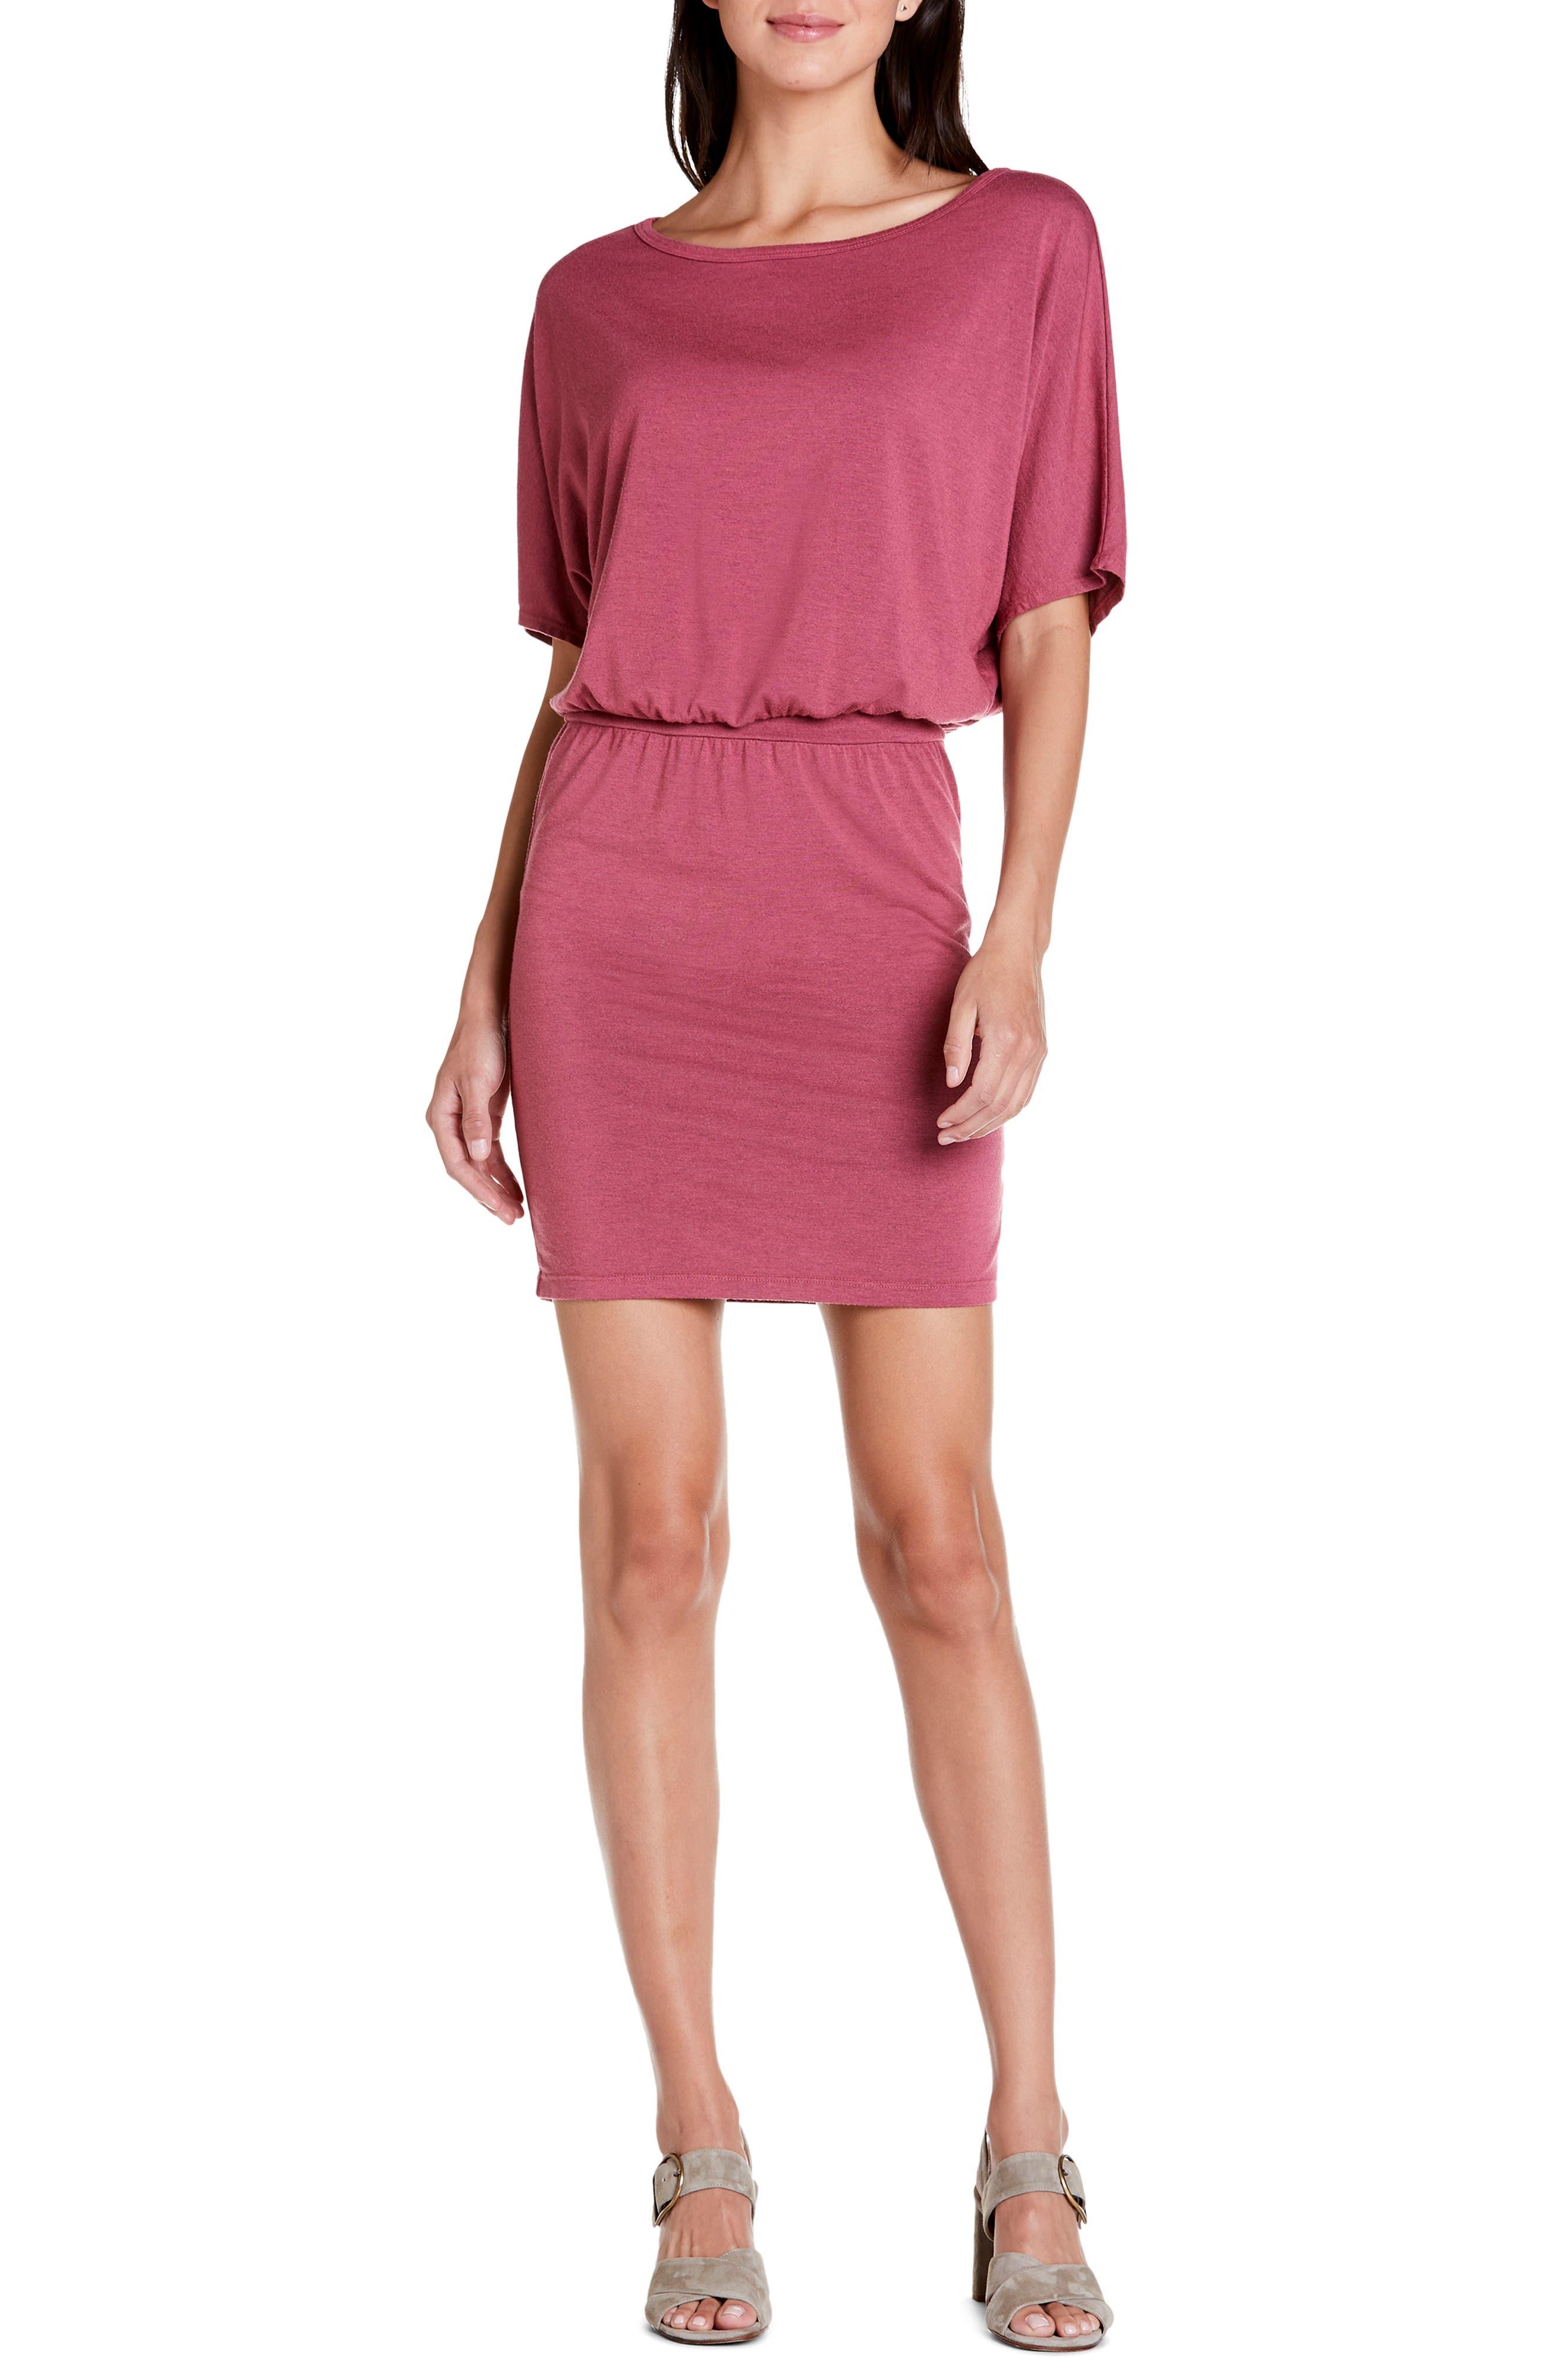 Michael Stars Erynn Elbow Sleeve Knit Dress, Pink